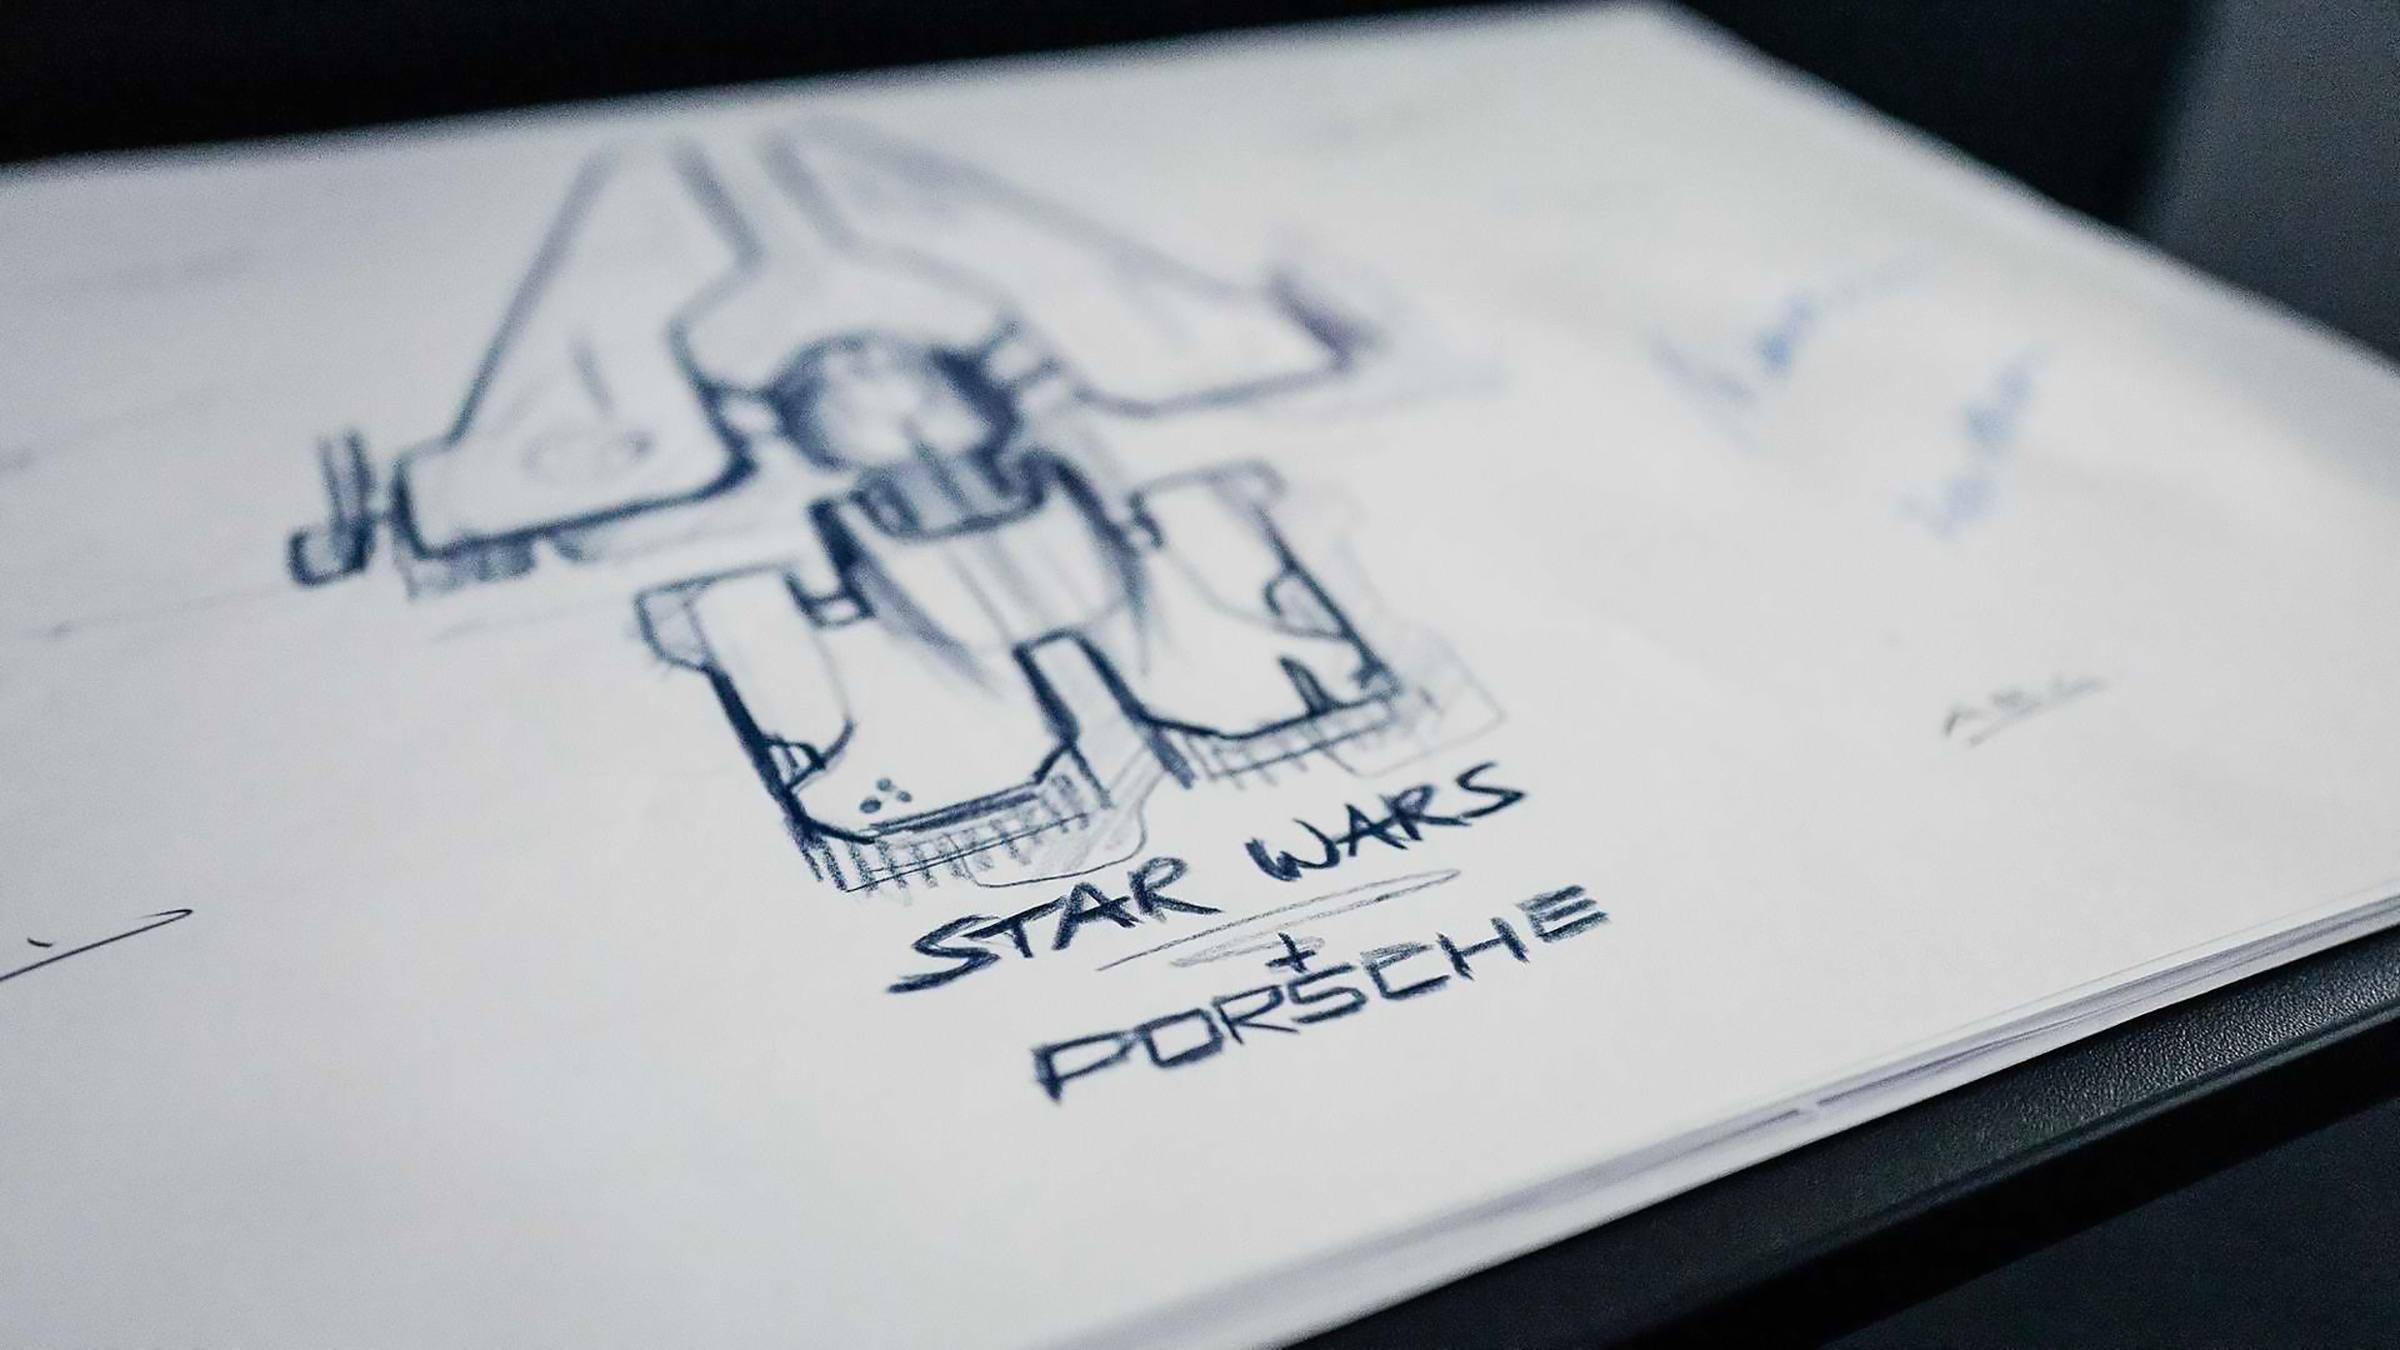 Porsche and Lucasfilm will debut a spacecraft for Star Wars Episode 9's premiere